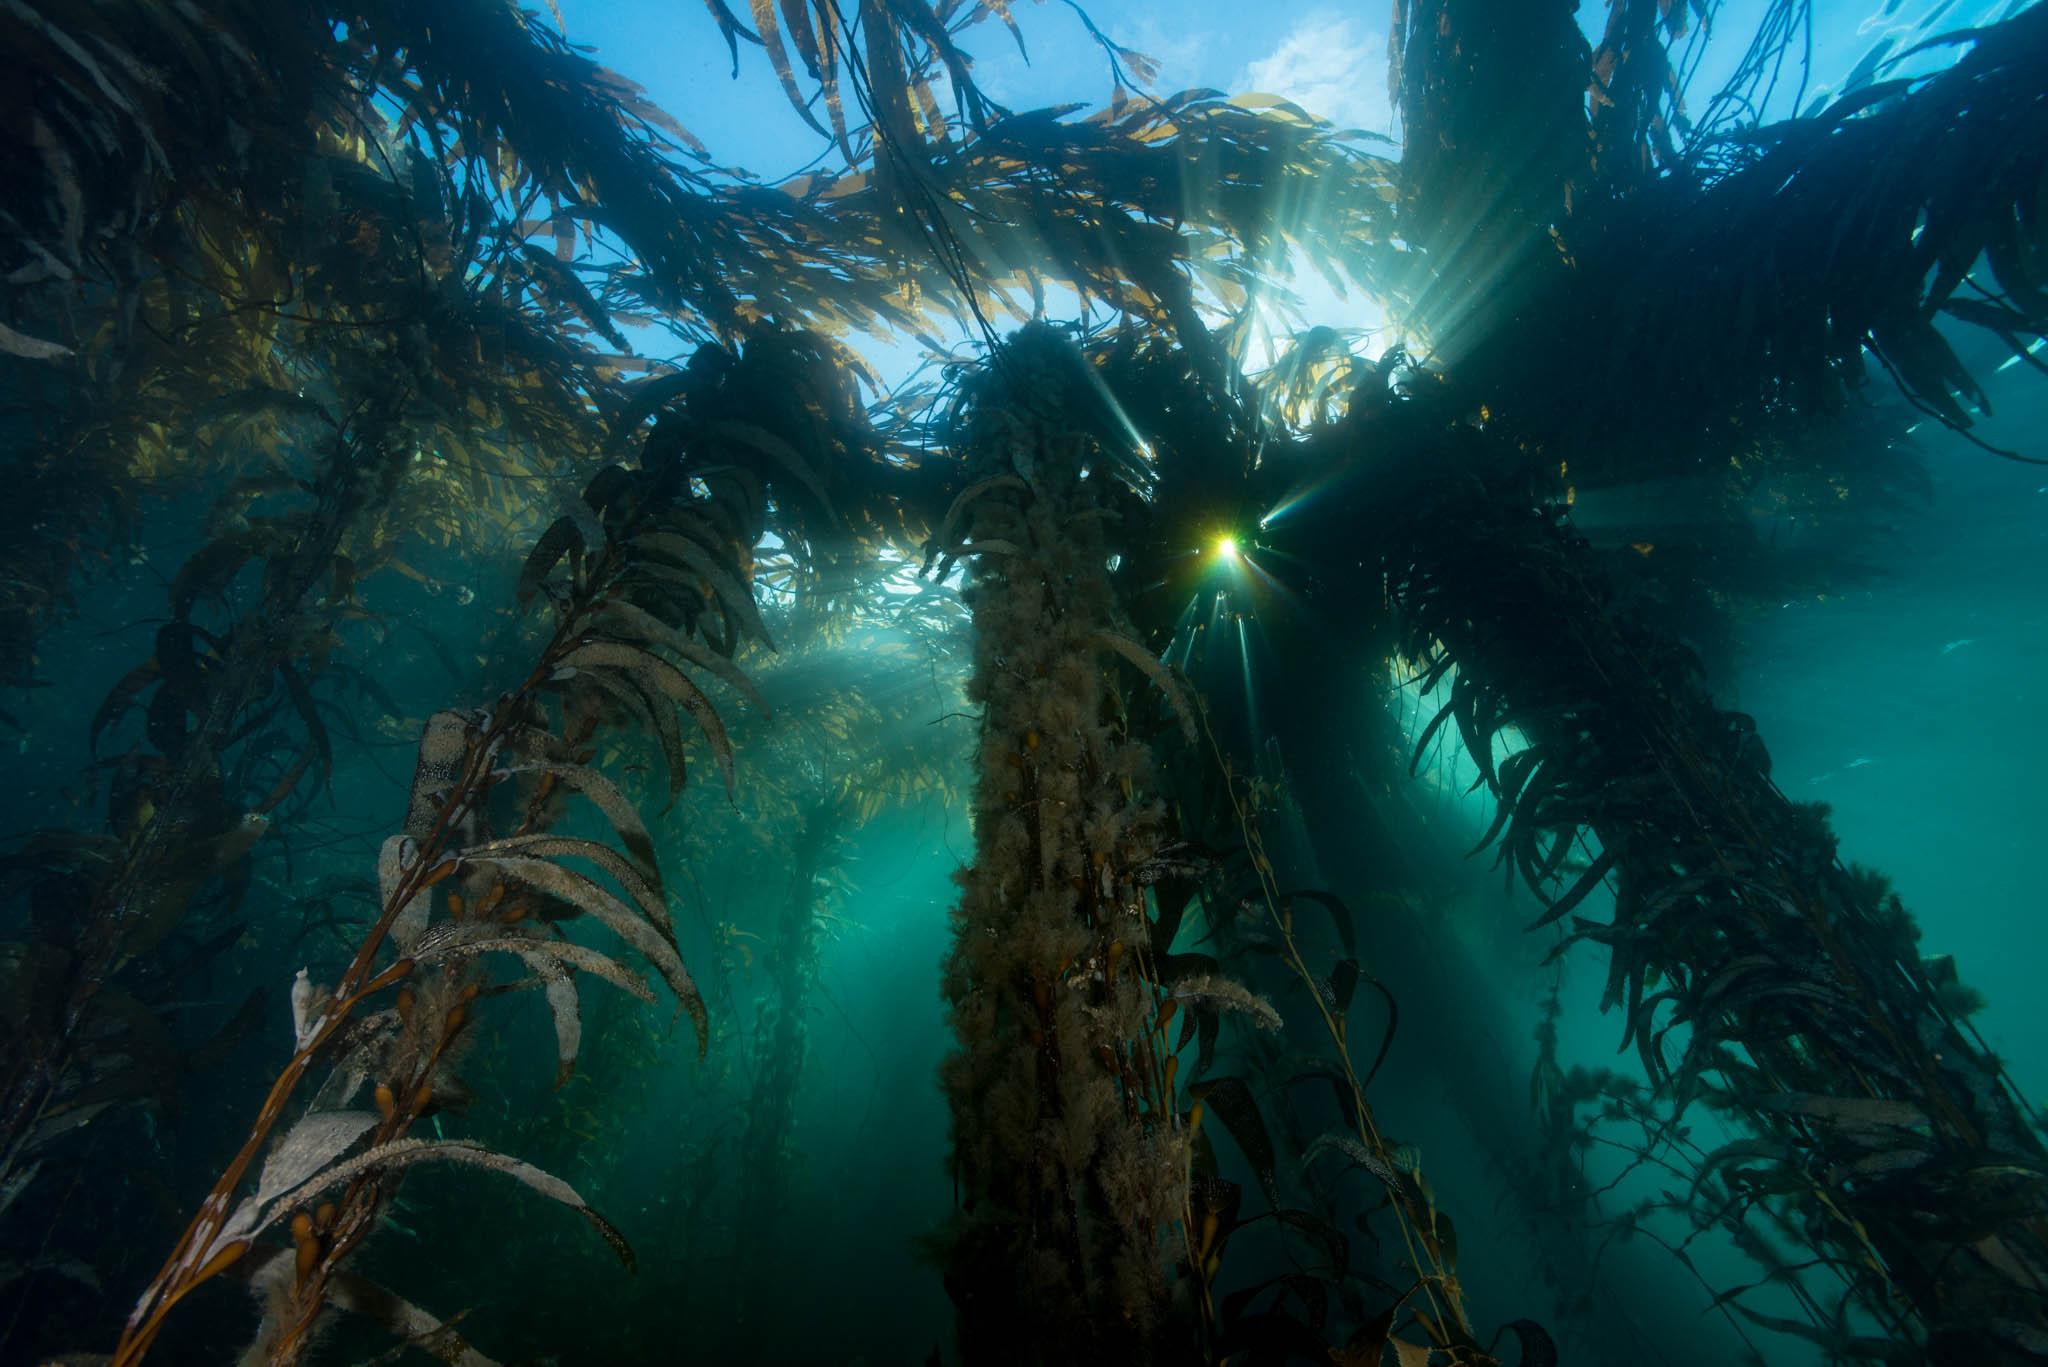 Falkland Islands Kelp Forest